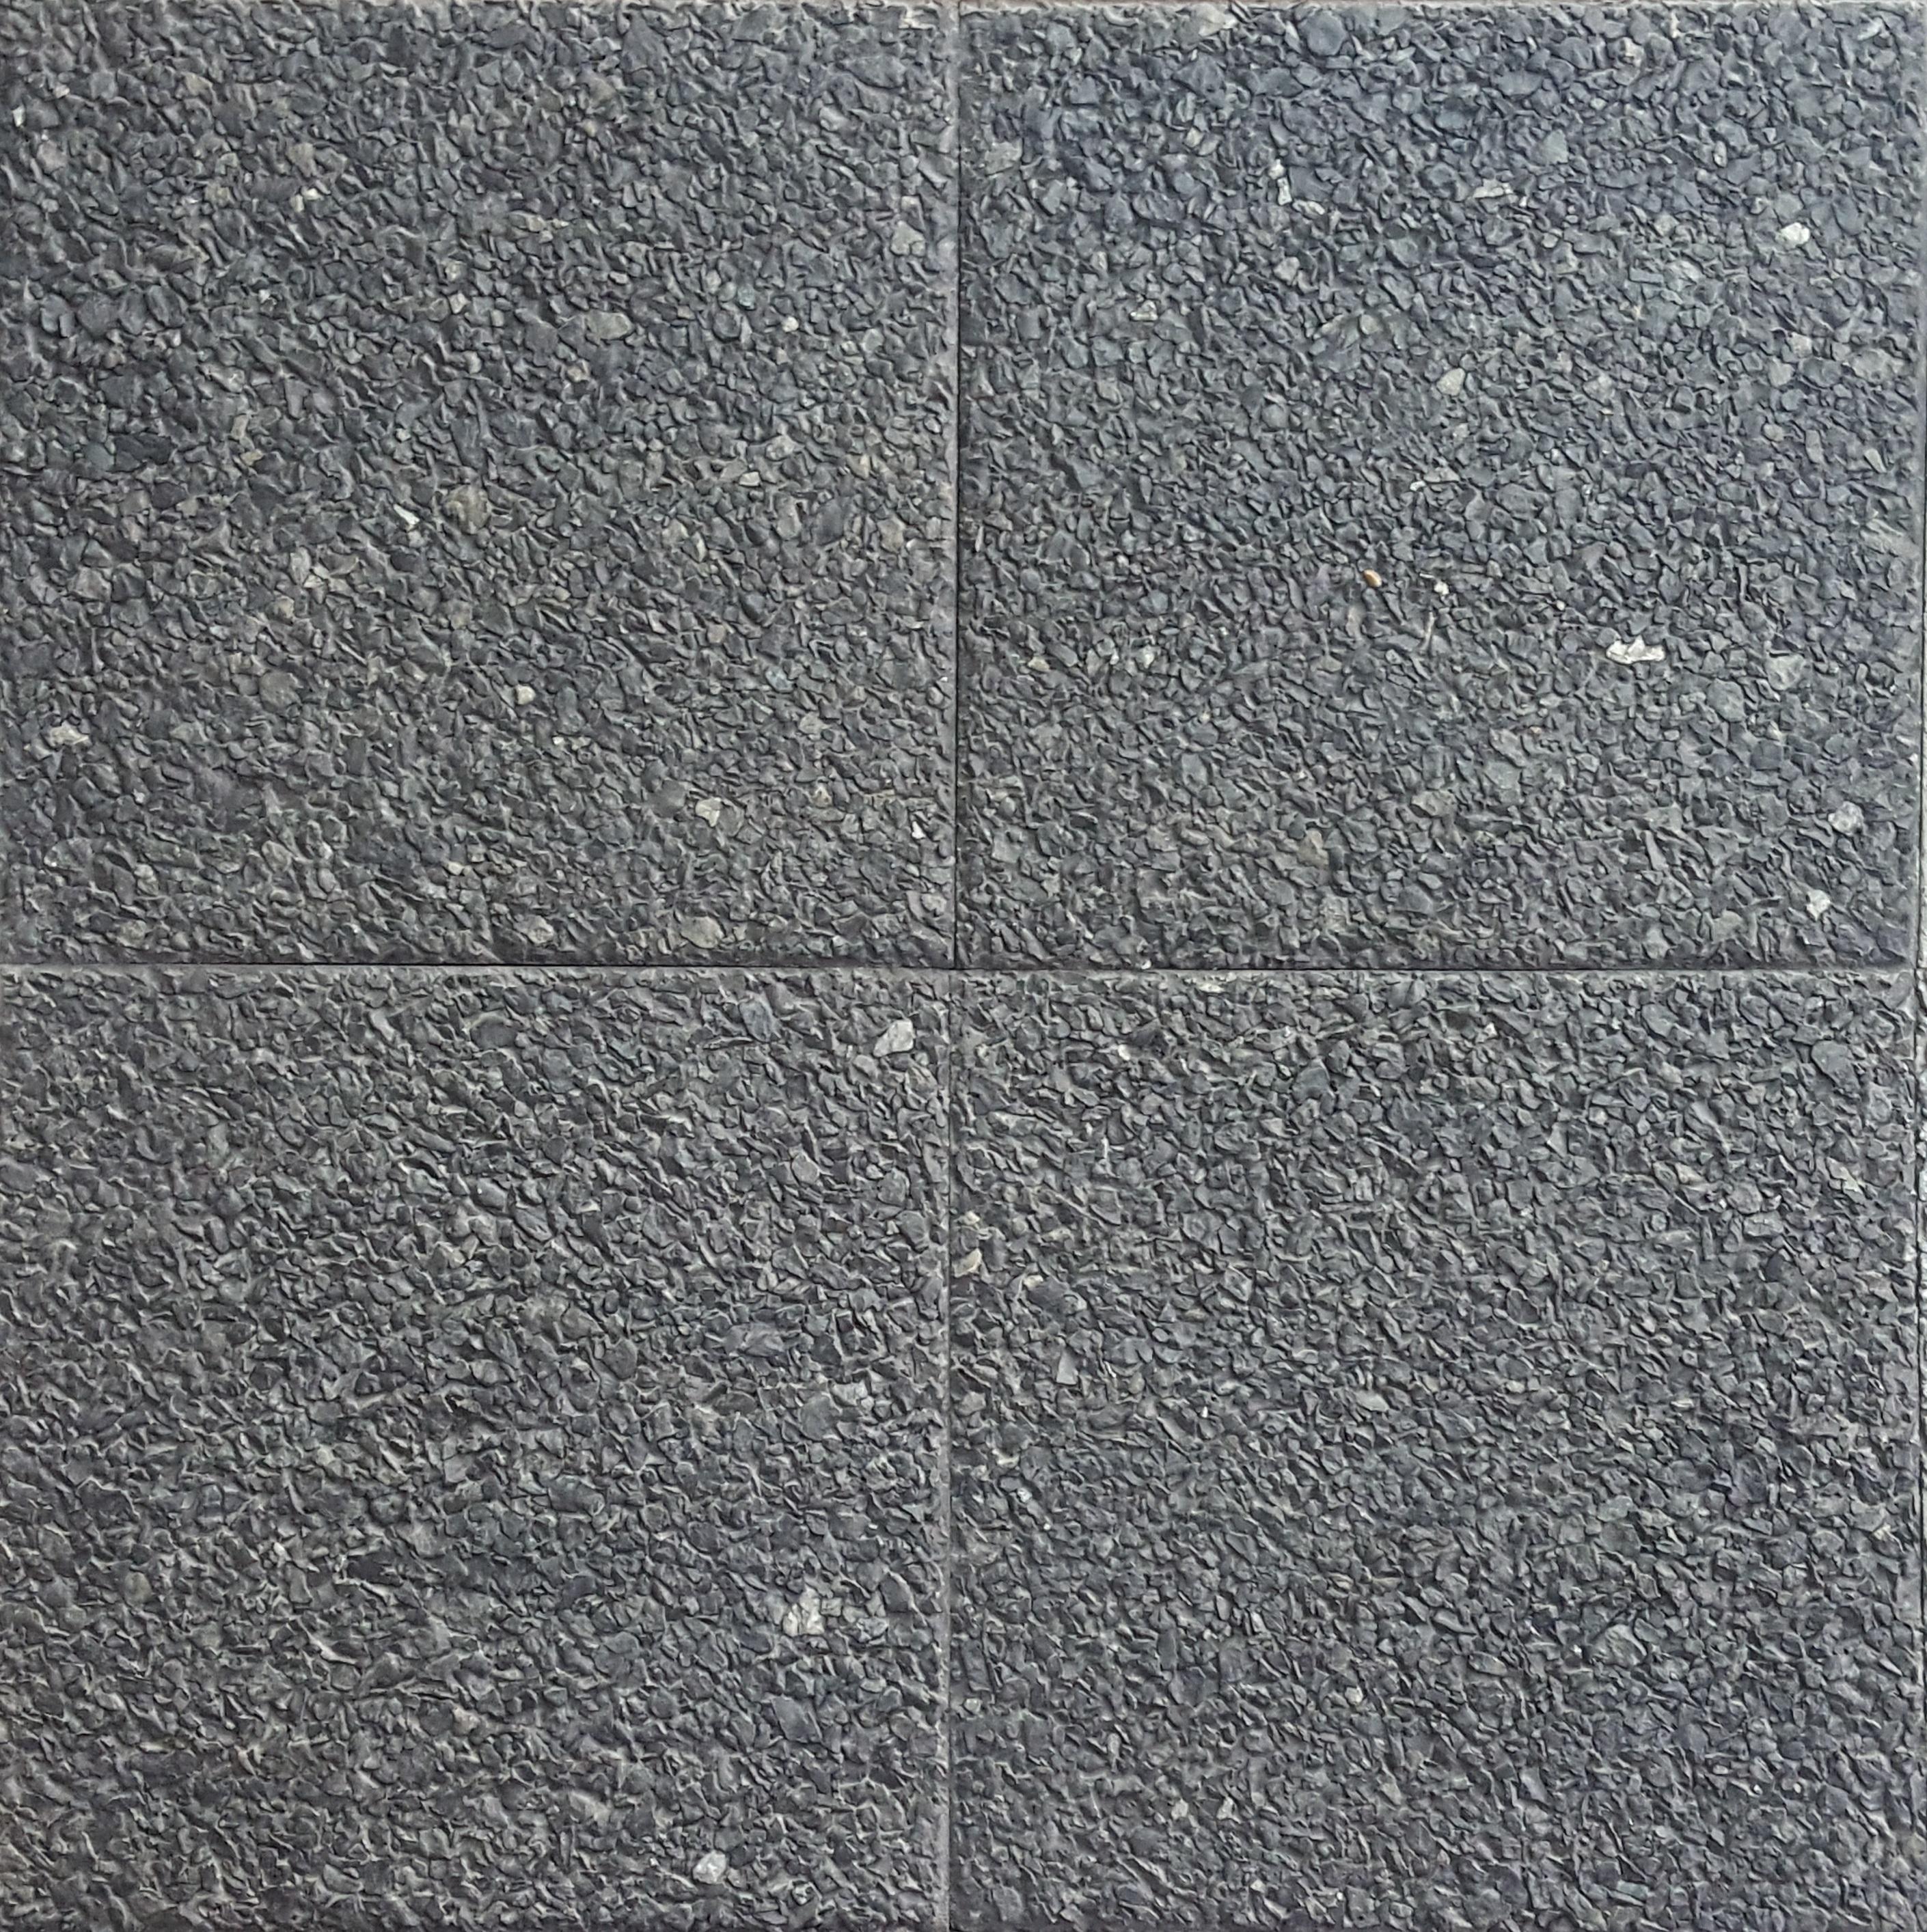 Piedra partida negra e01 baldosaszonasur2a Baldosa pared piedra